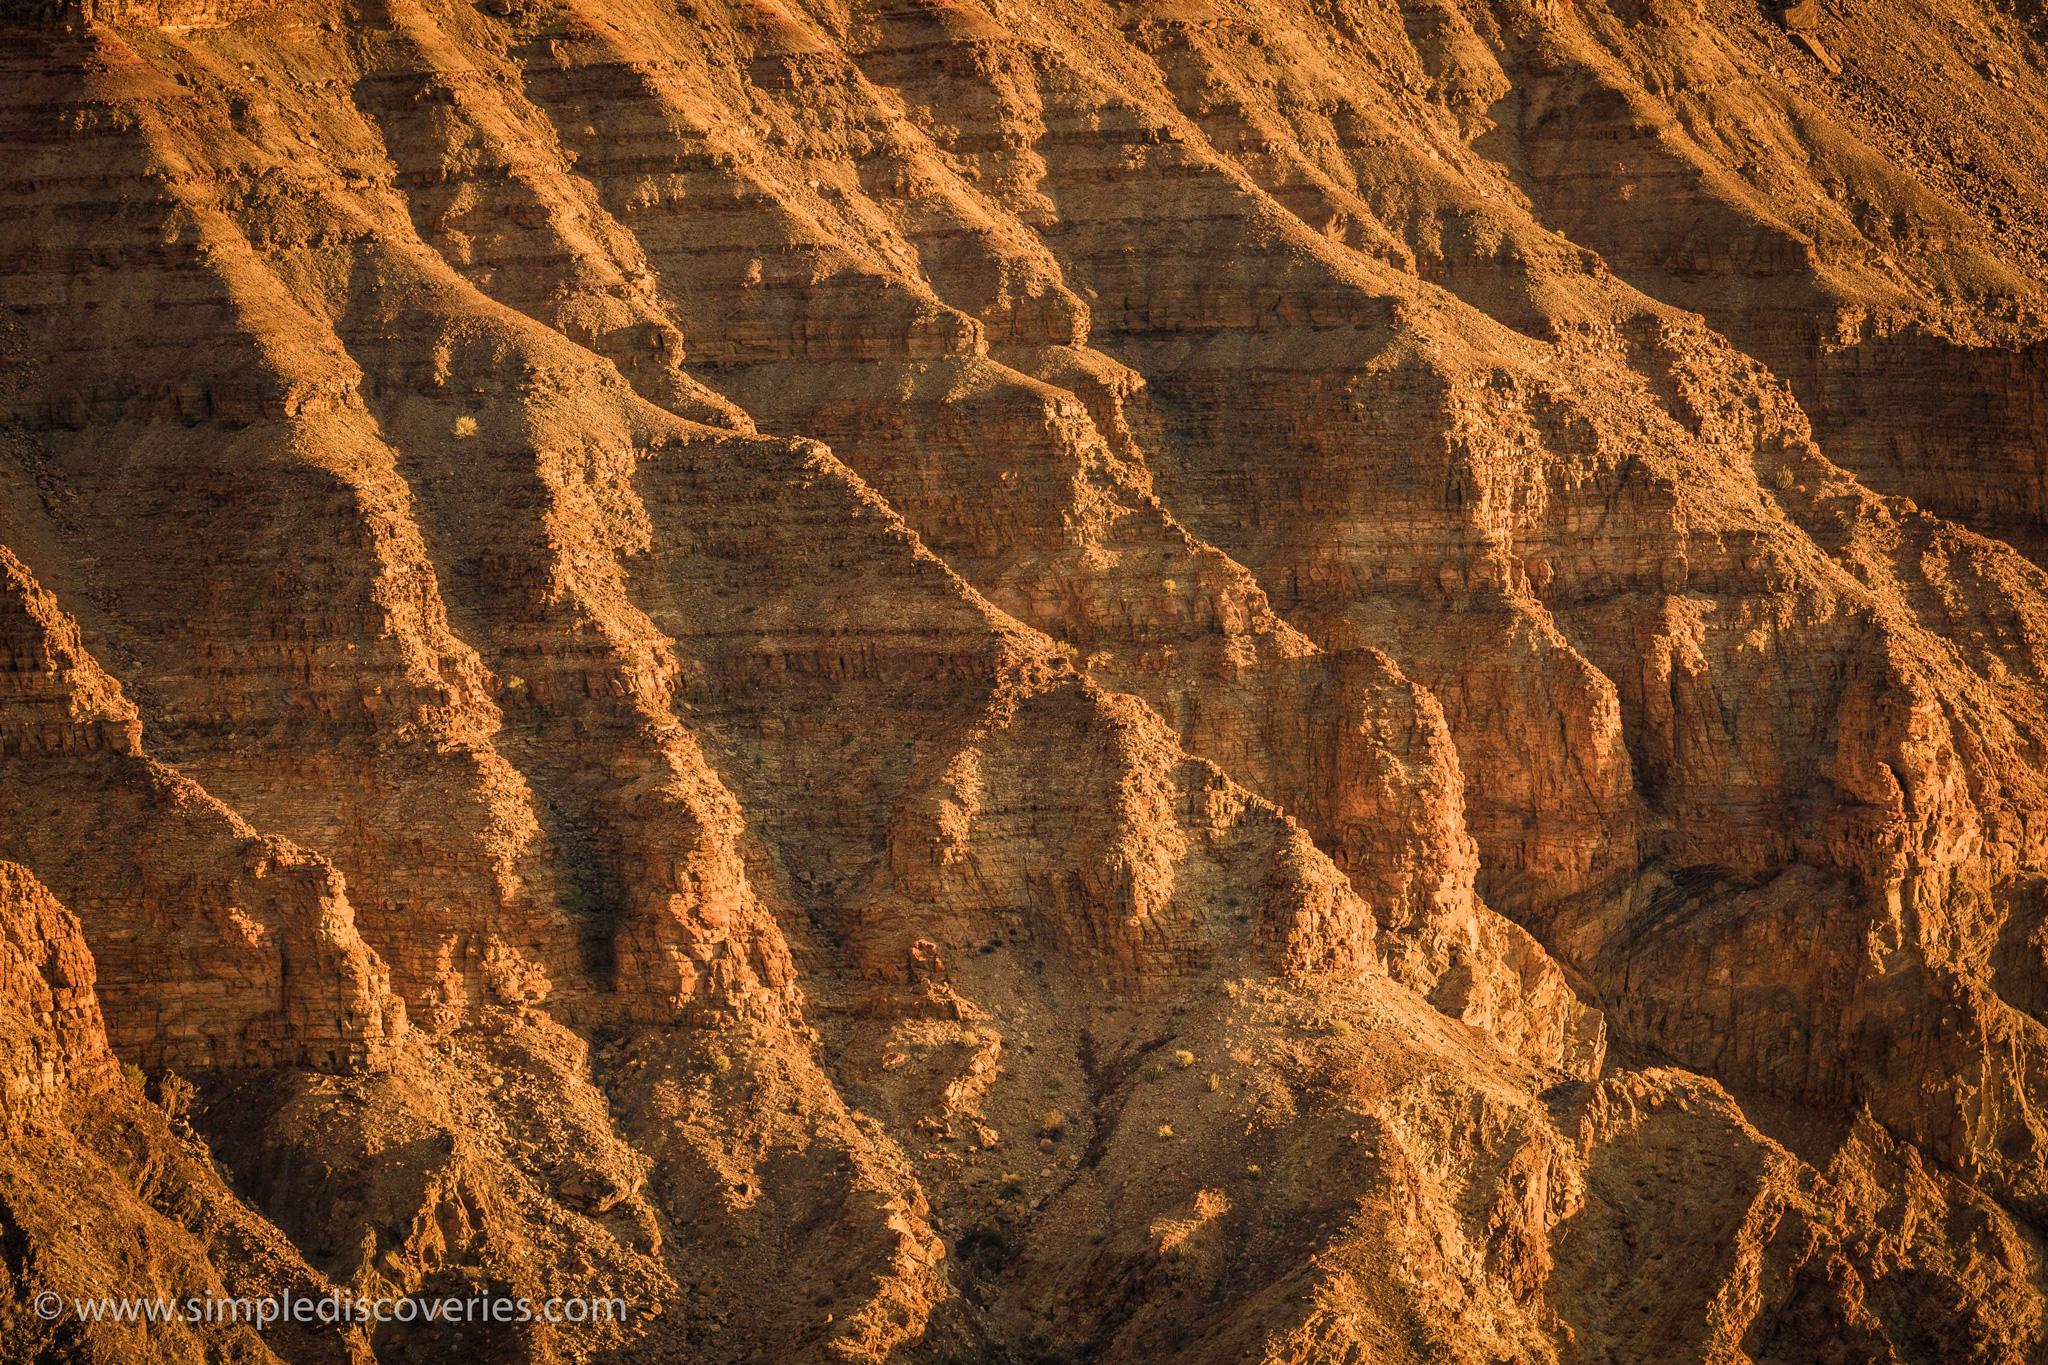 namibia_canyon_layers